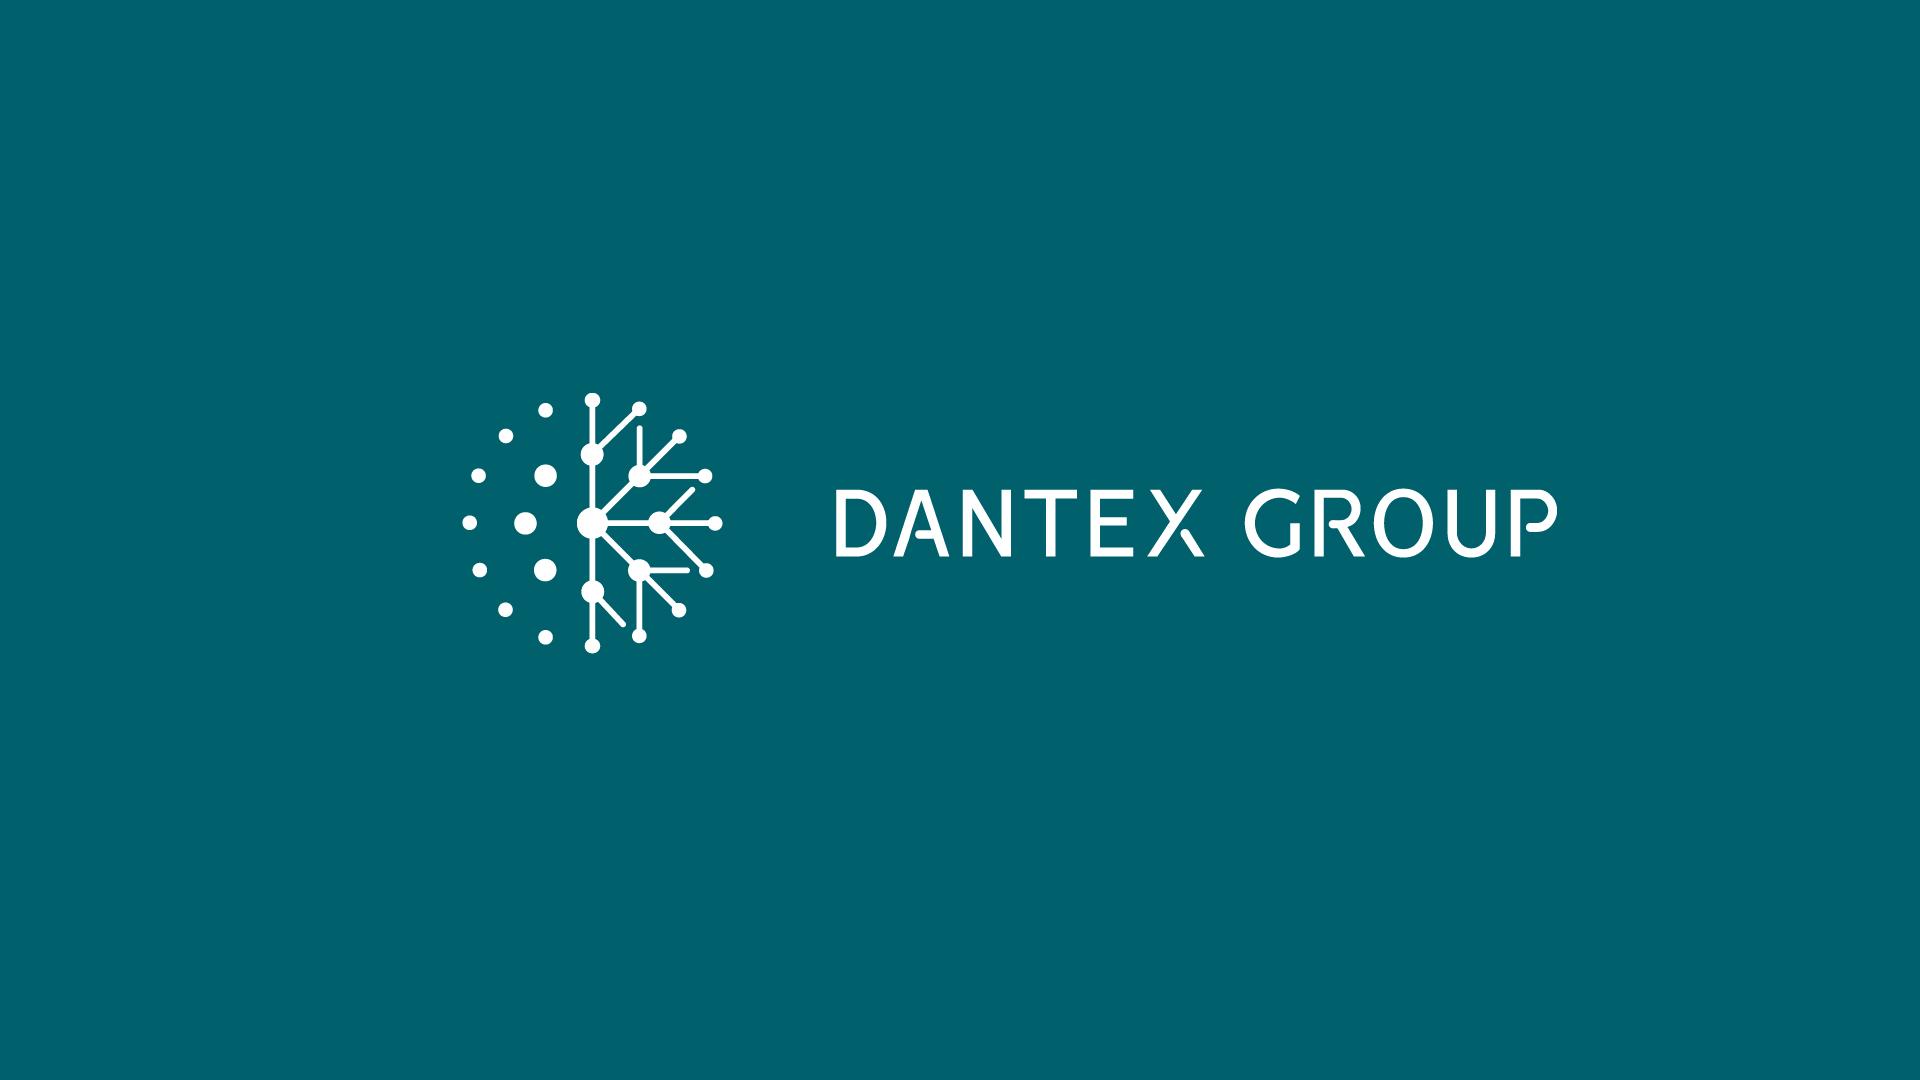 Конкурс на разработку логотипа для компании Dantex Group  фото f_8955c110be0e4c17.jpg